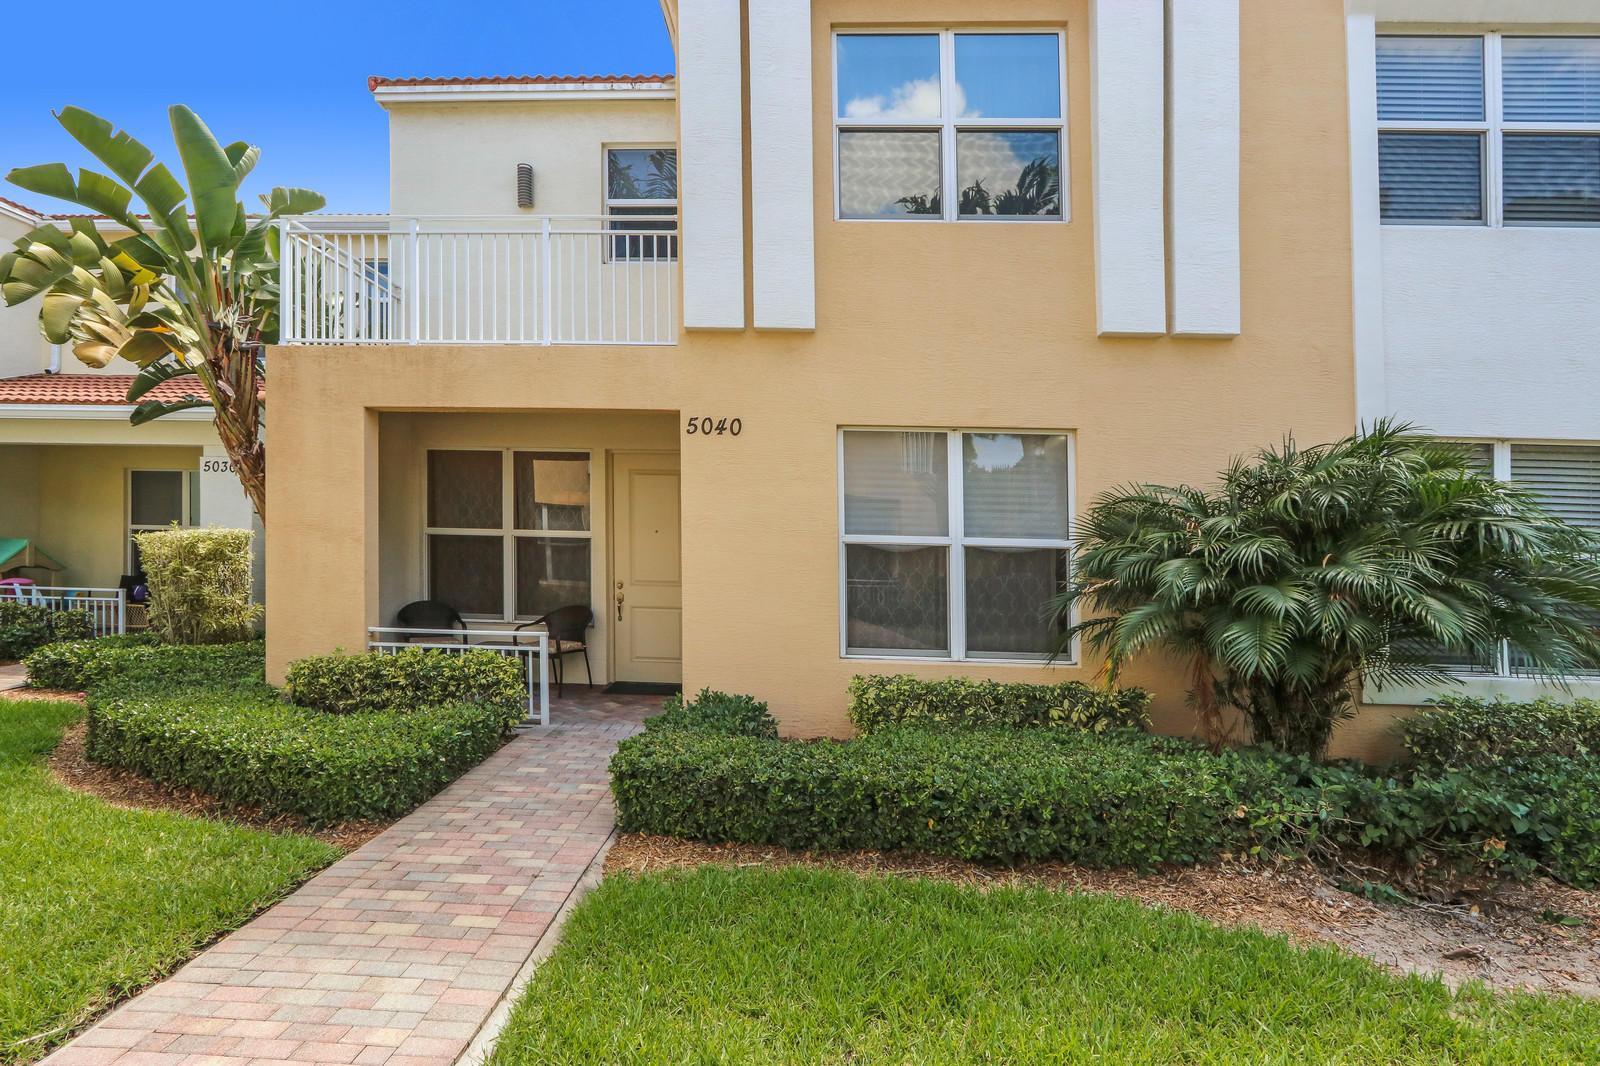 5040 NW 15TH Terrace Boca Raton, FL 33431